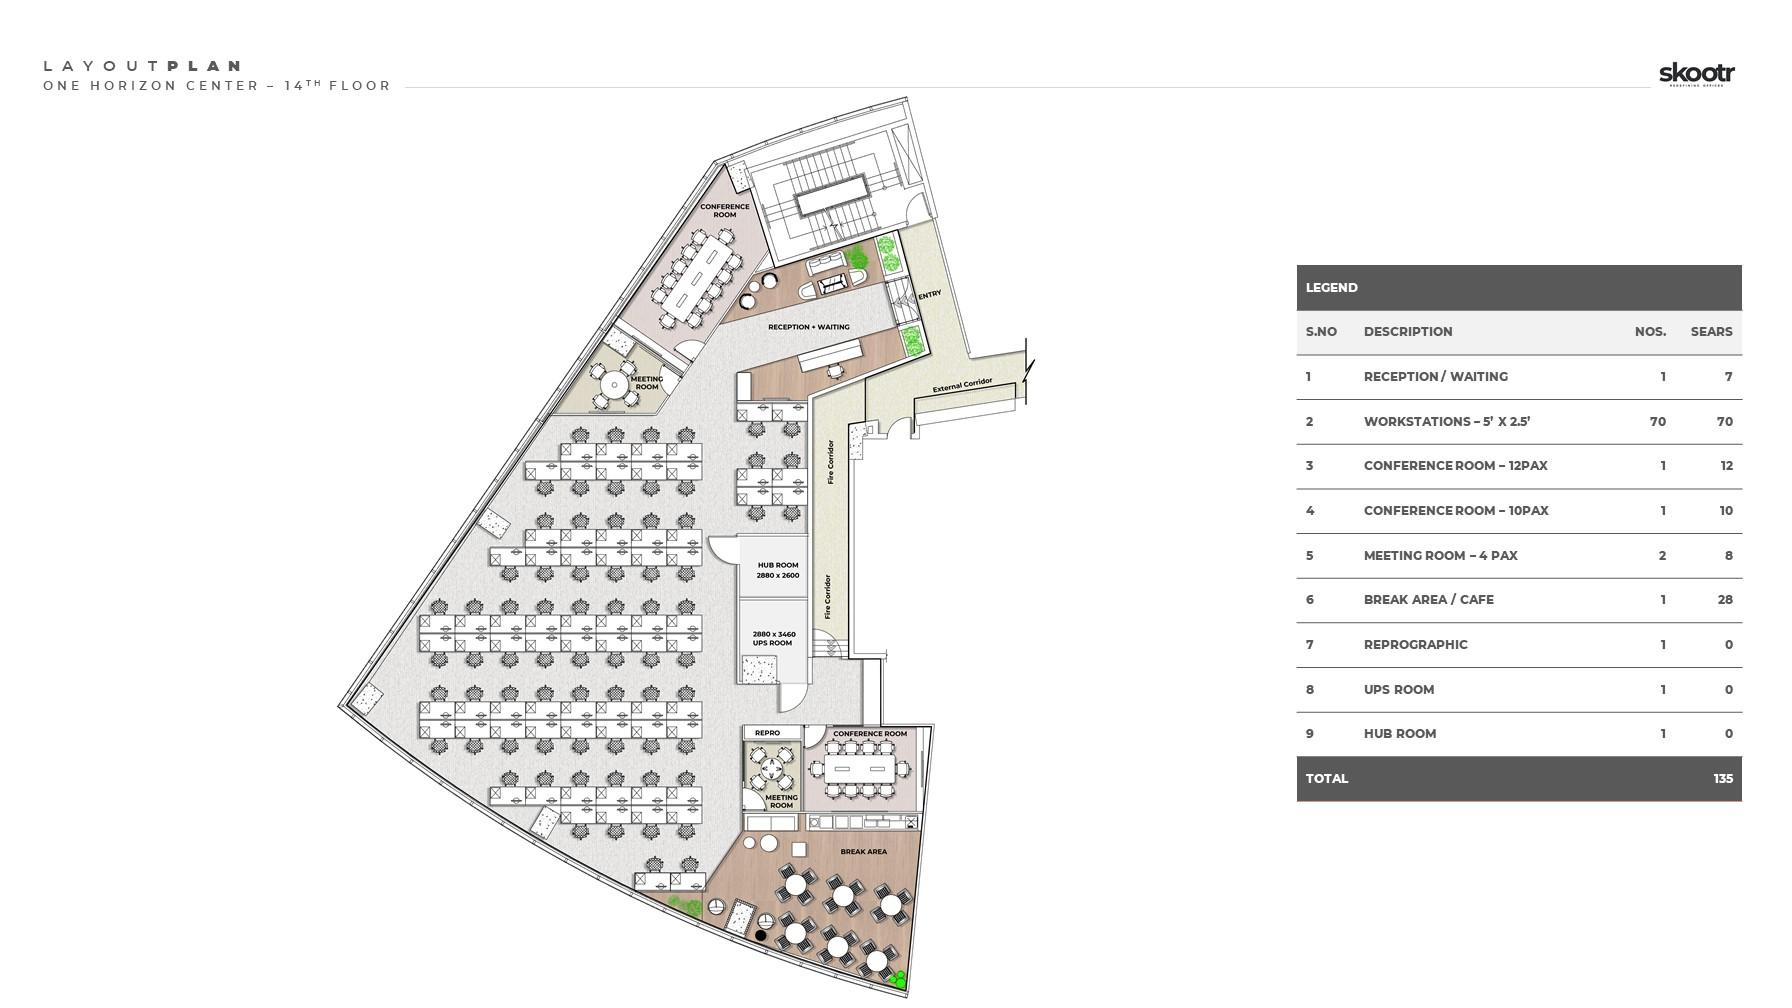 Skootr One Horizon Centre Layout Plan